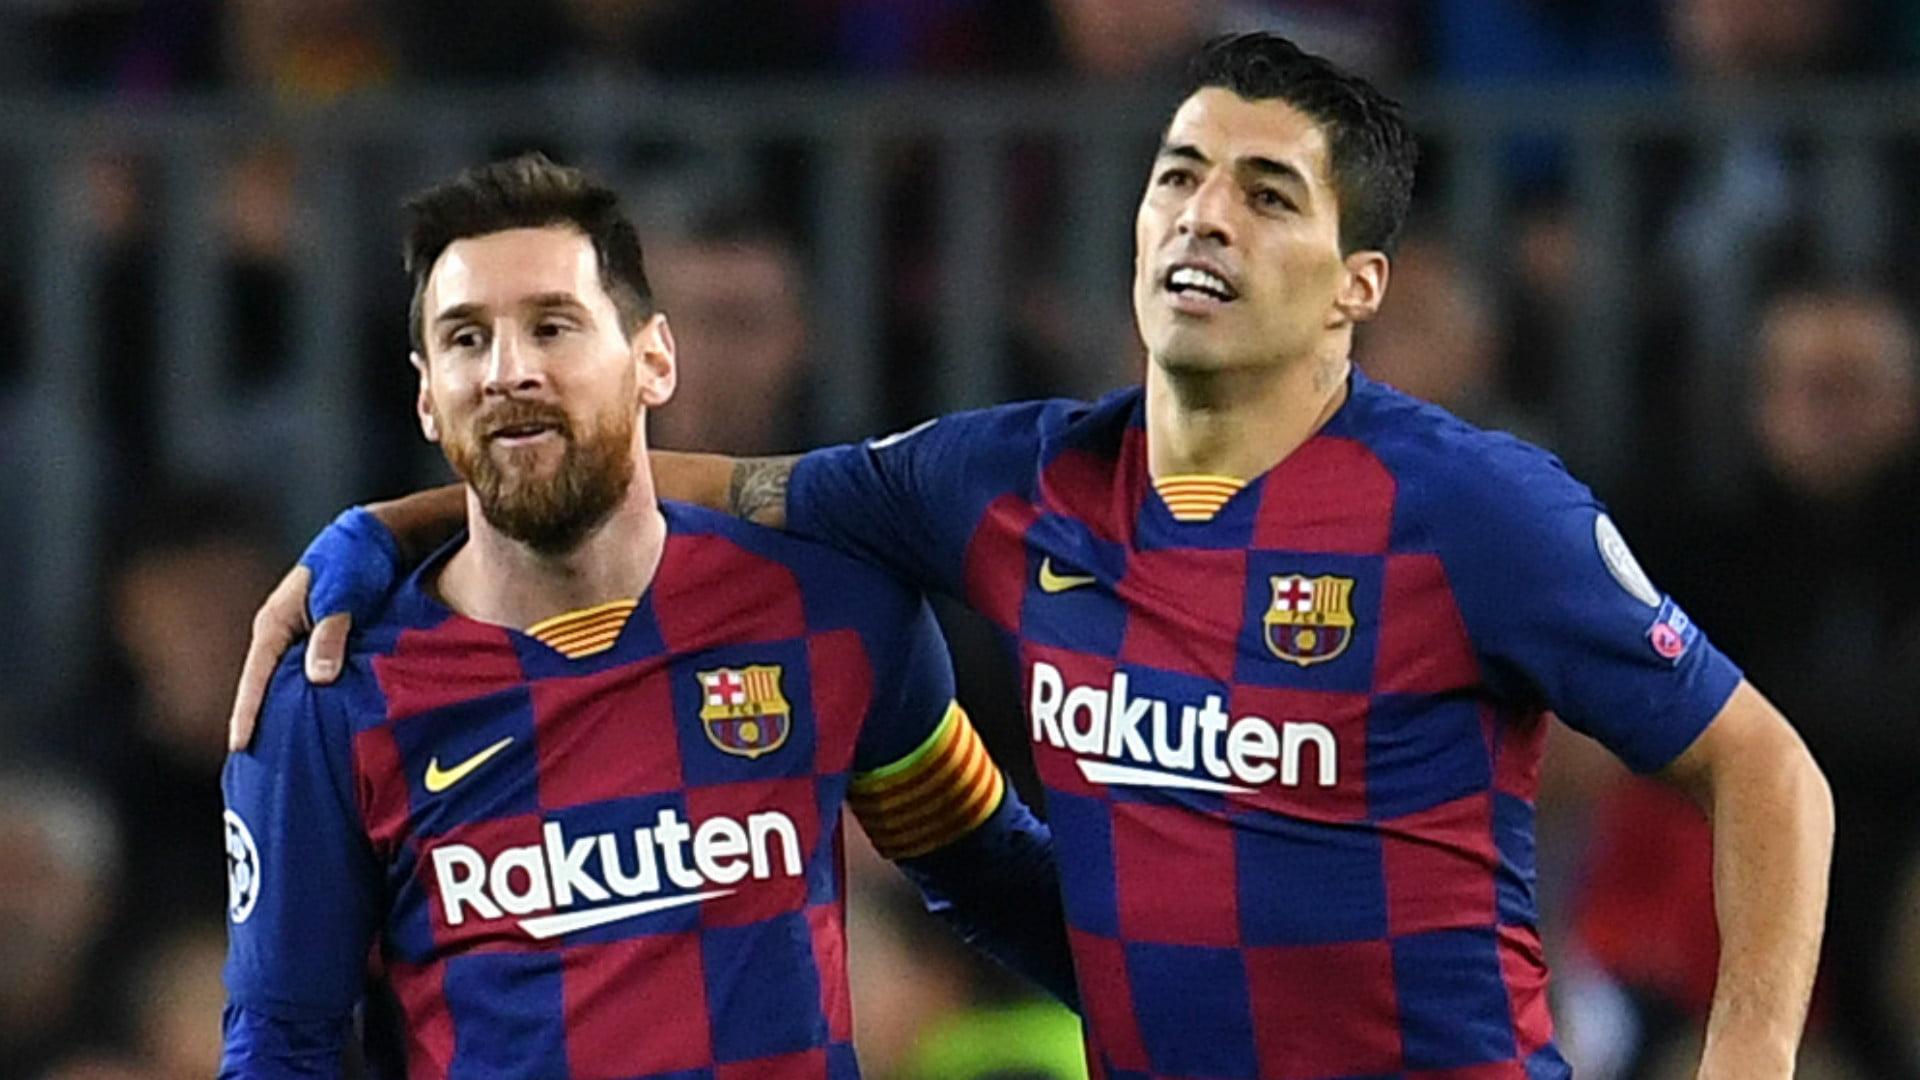 Luis Suarez Backs Messi's Decision To Leave Barcelona